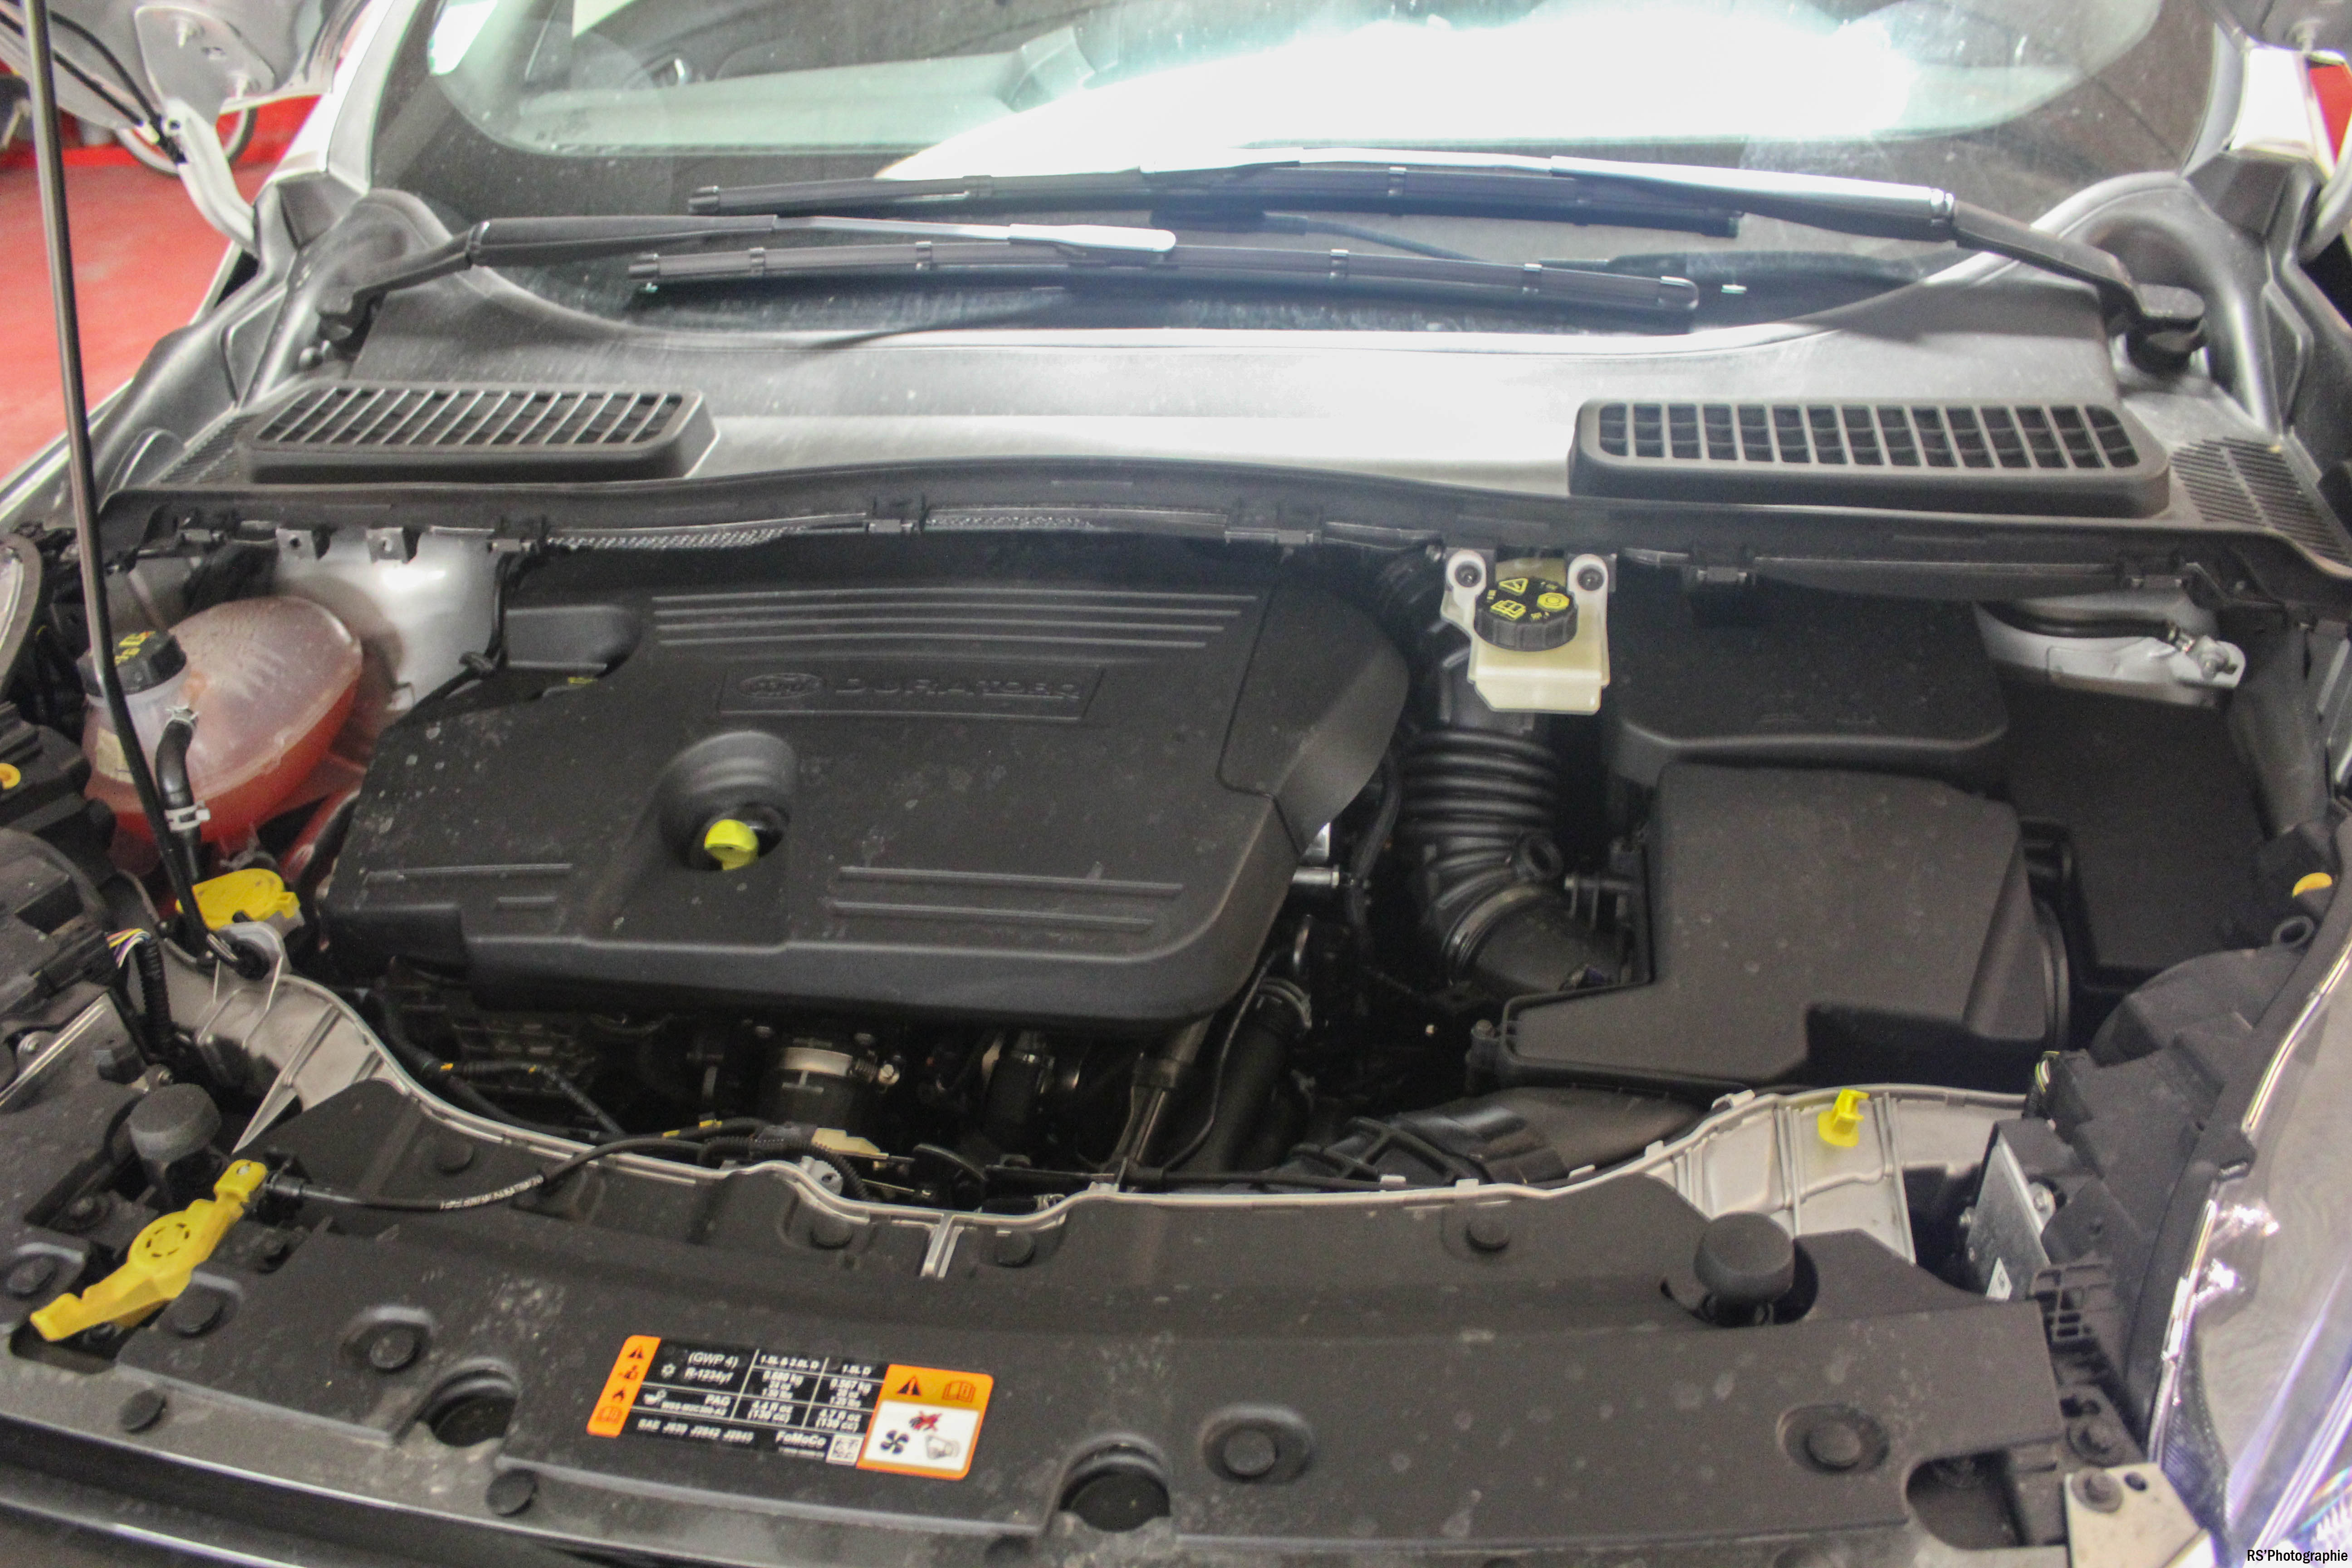 FordKuga32-ford-kuga-150-moteur-engine-arnaud-demasier-rsphotographie